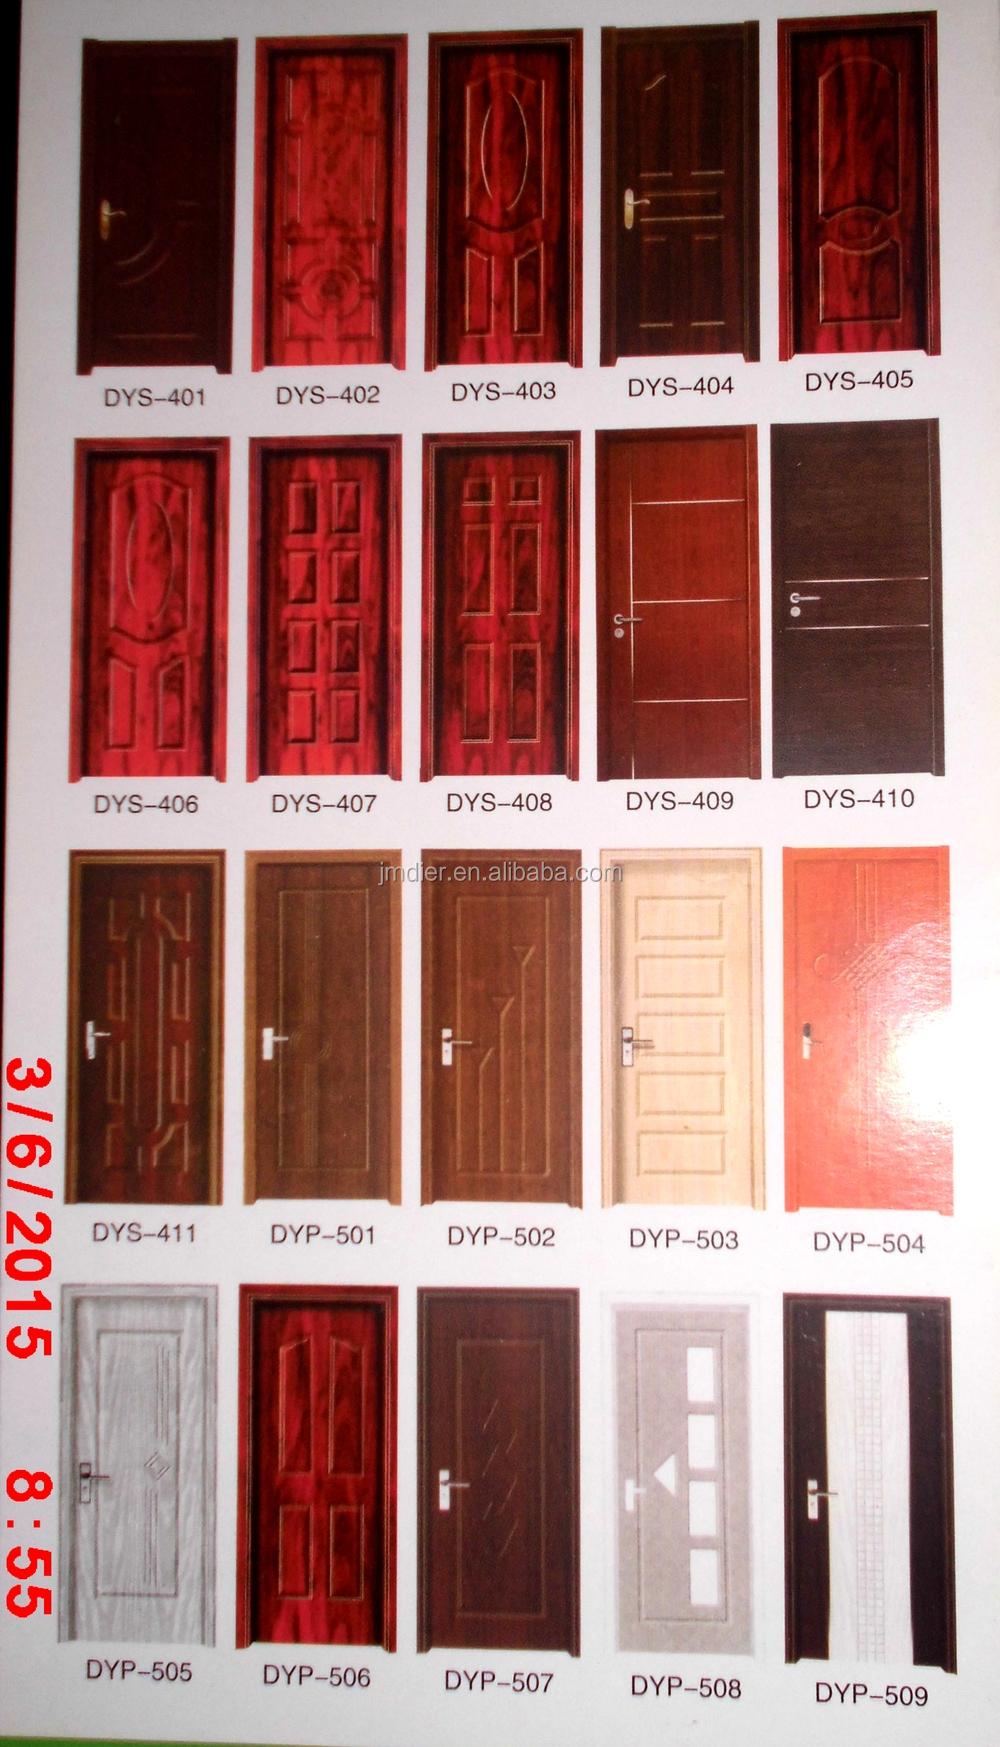 China factory 2hour fire rated wooden door buy 2hour for 1 hour fire rated wood door